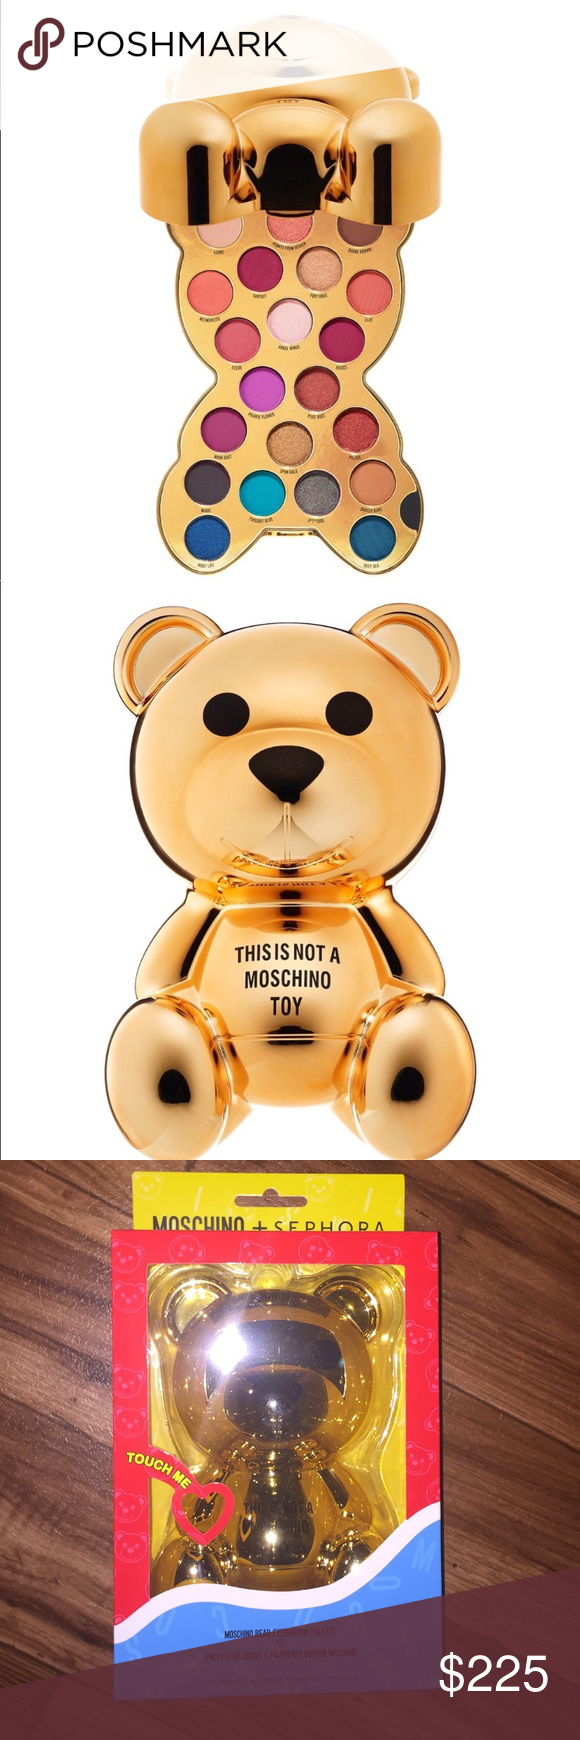 Moschino Sephora Moschino Sephora Teddy Bear Eyeshadow Pallet New In